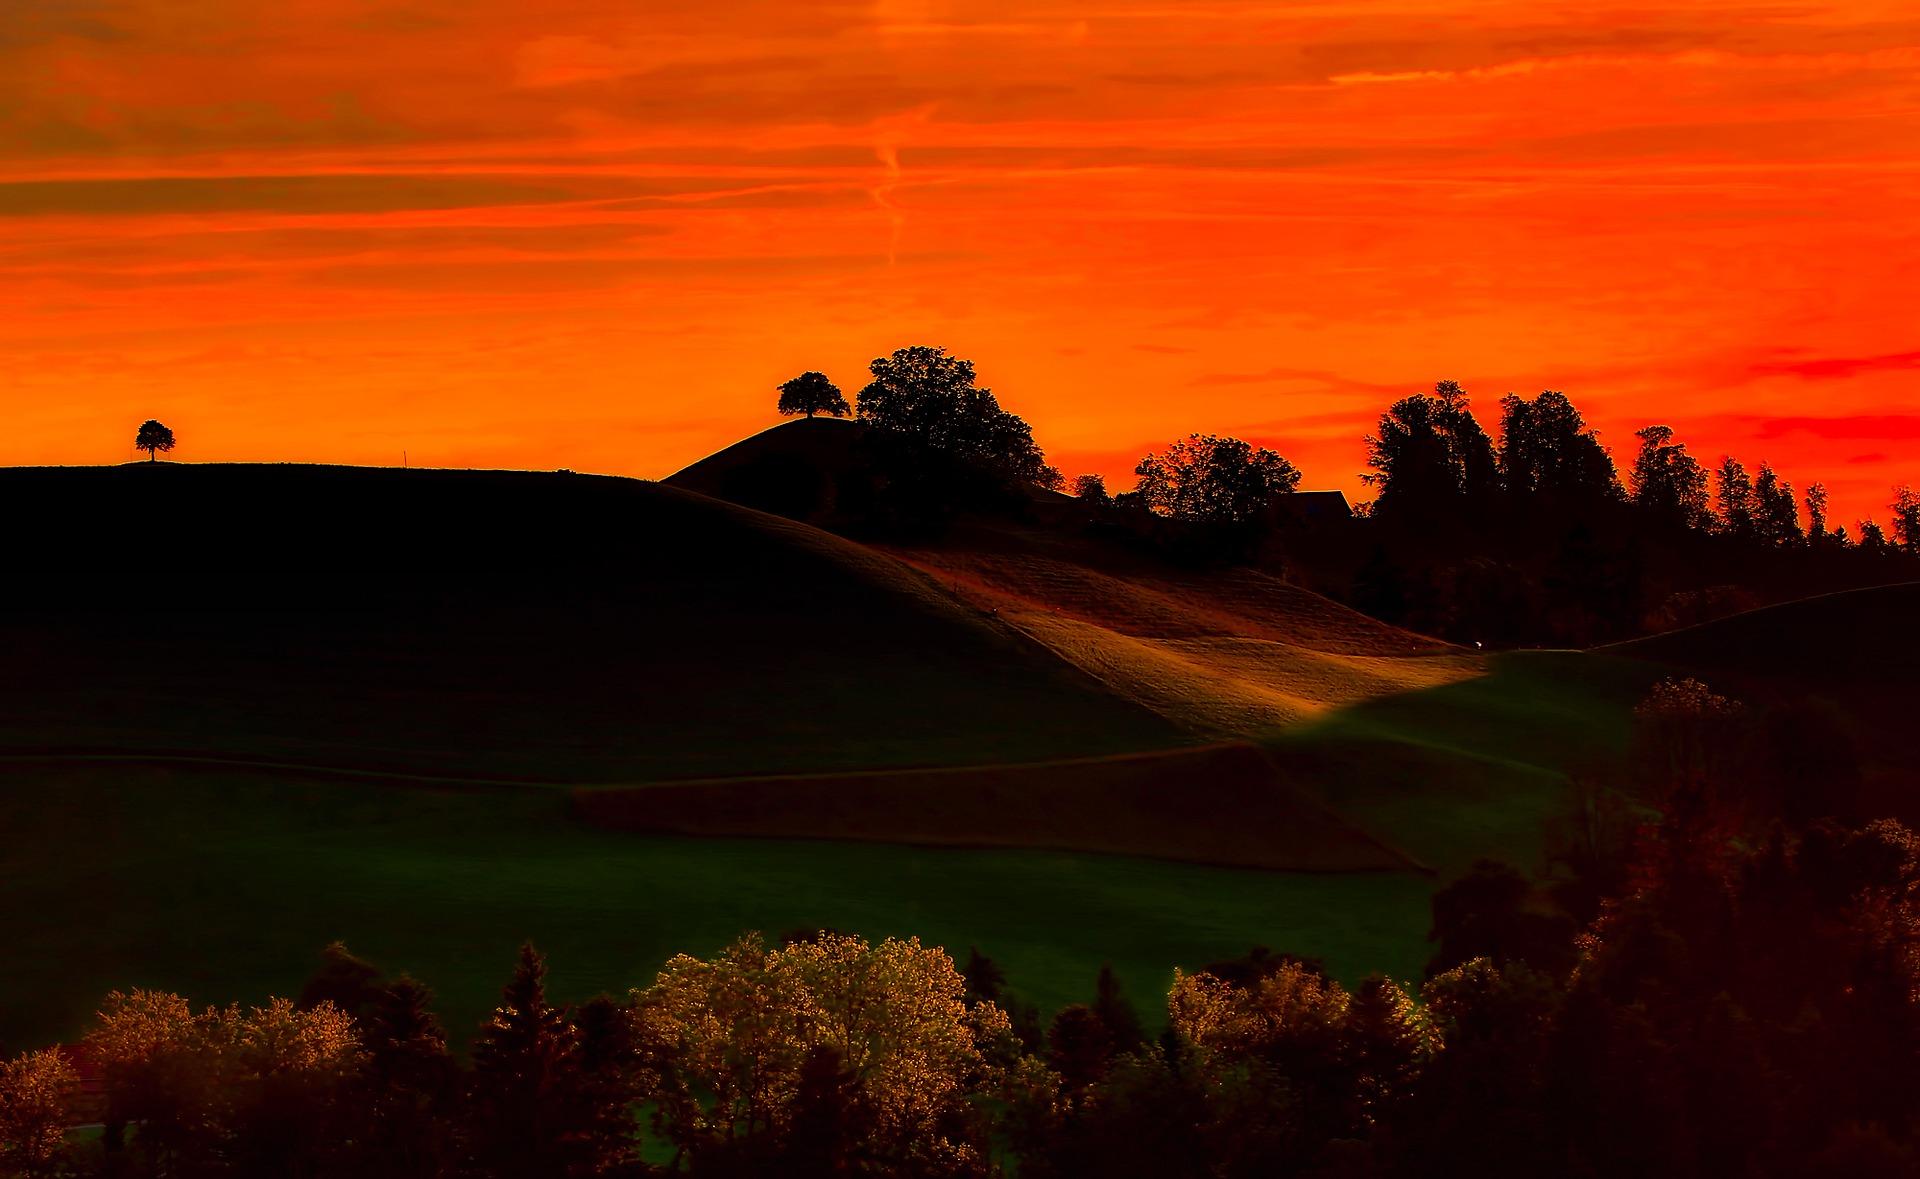 Sunset in Switzerland